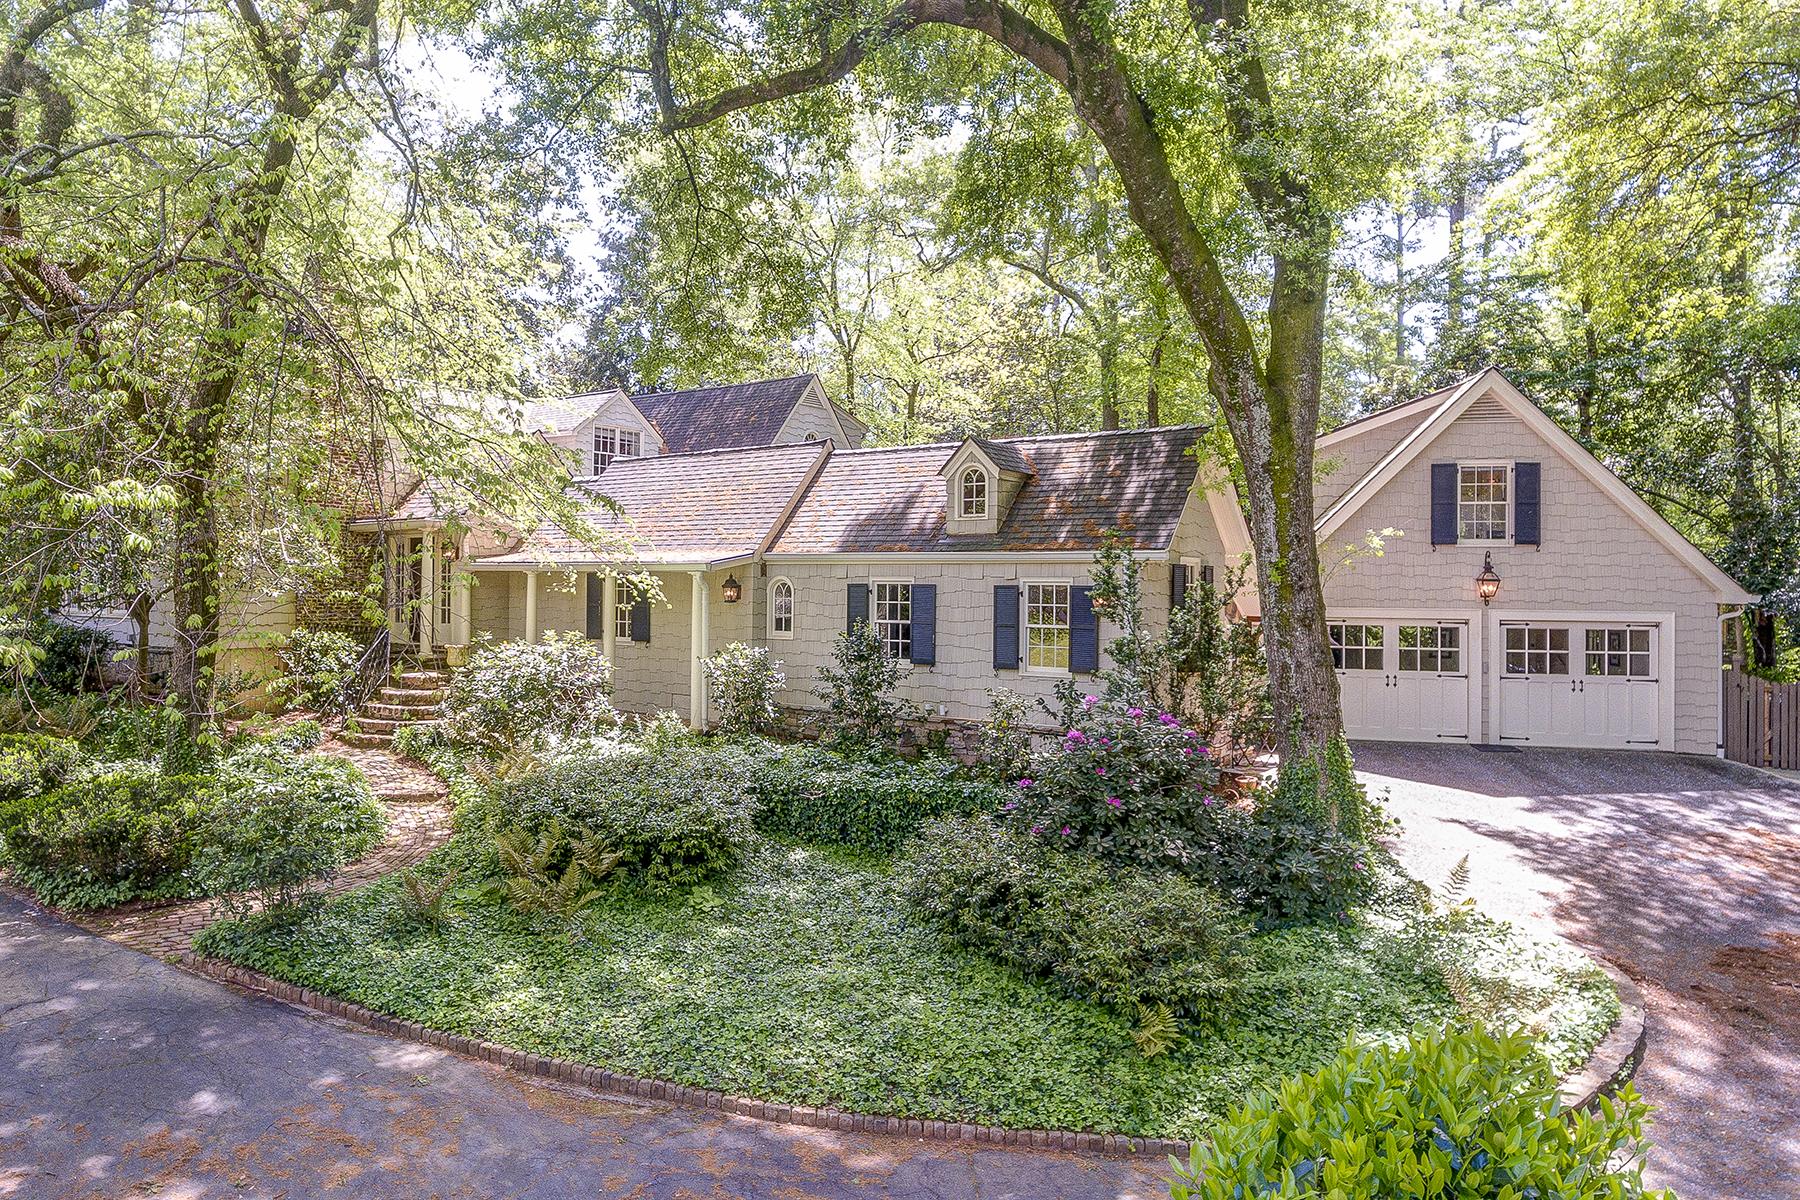 Single Family Home for Sale at Enchanting Property In Tuxedo Park 4047 Tuxedo Road NW Atlanta, Georgia 30342 United States